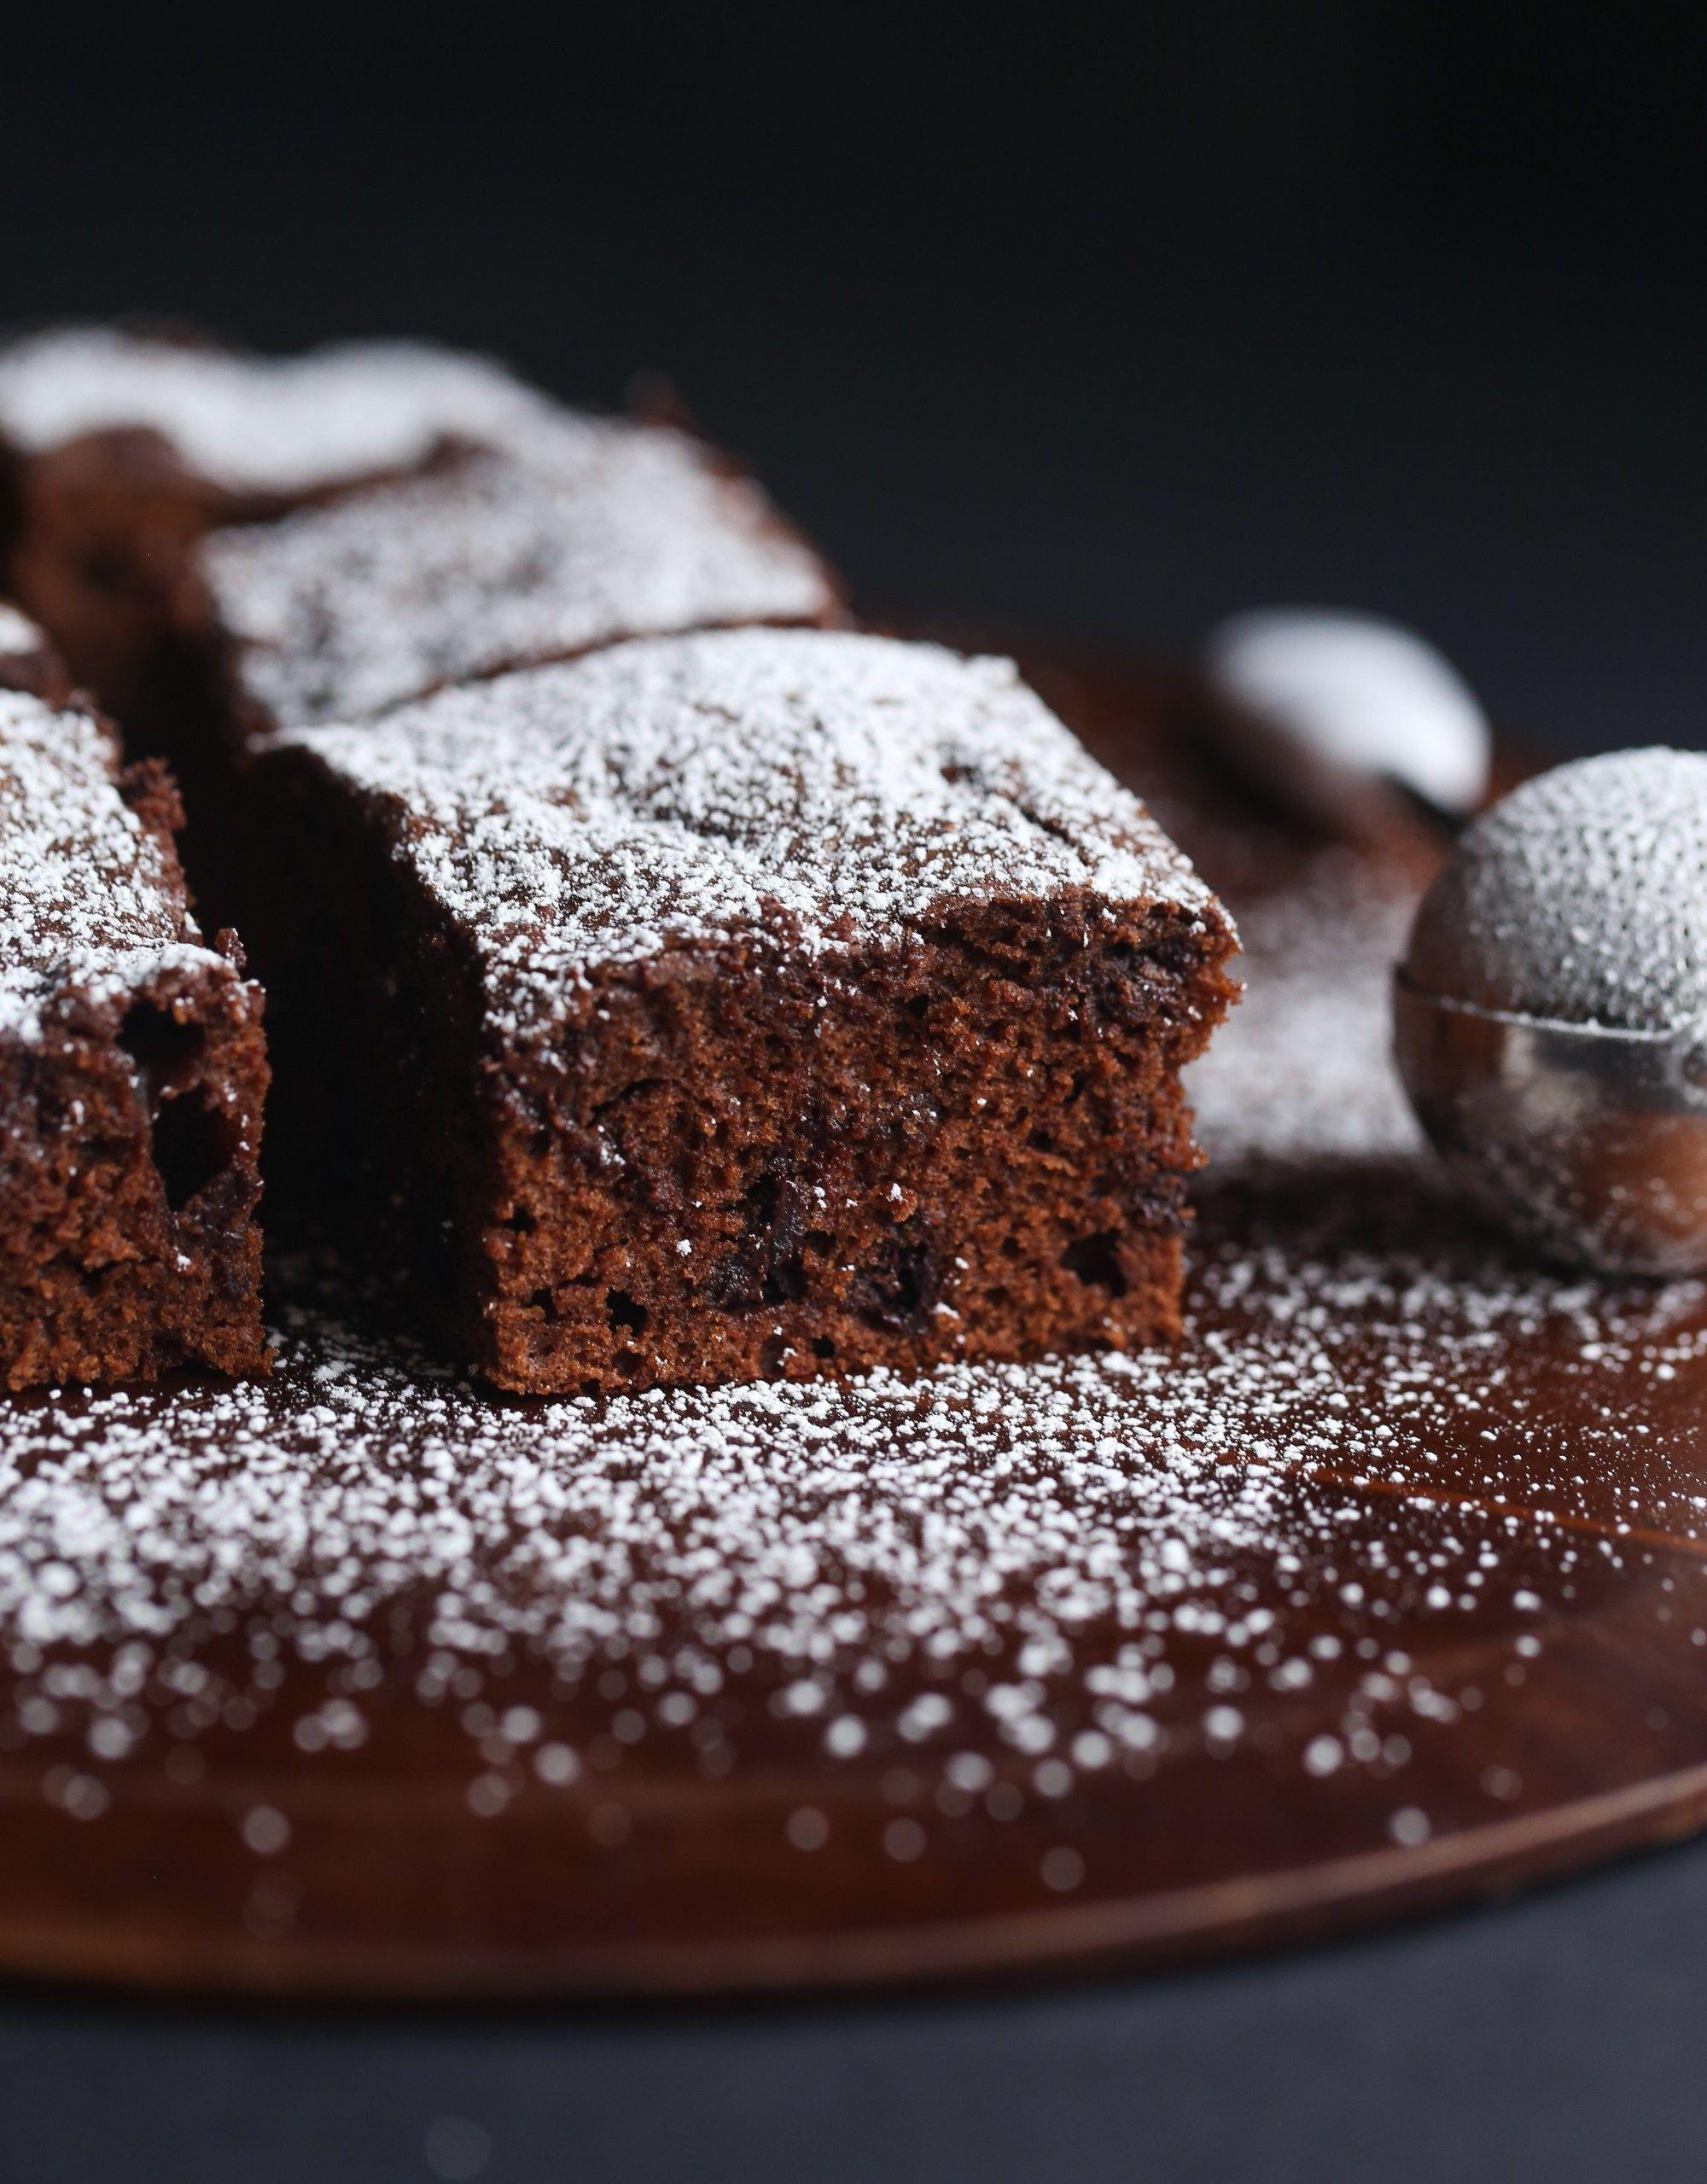 Sour Cream Chocolate Cake It S Like A Cross Between Cake And A Brownie Sour Cream Chocolate Cake Sour Cream Recipes Sour Cream Cake